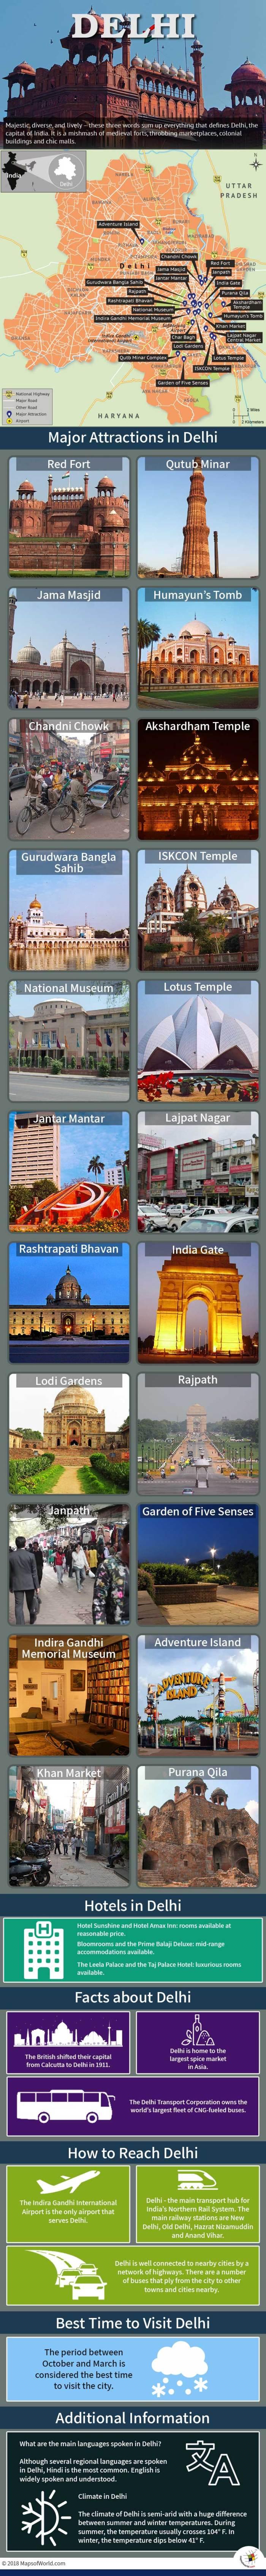 Infographic Depicting Delhi Tourist Attractions